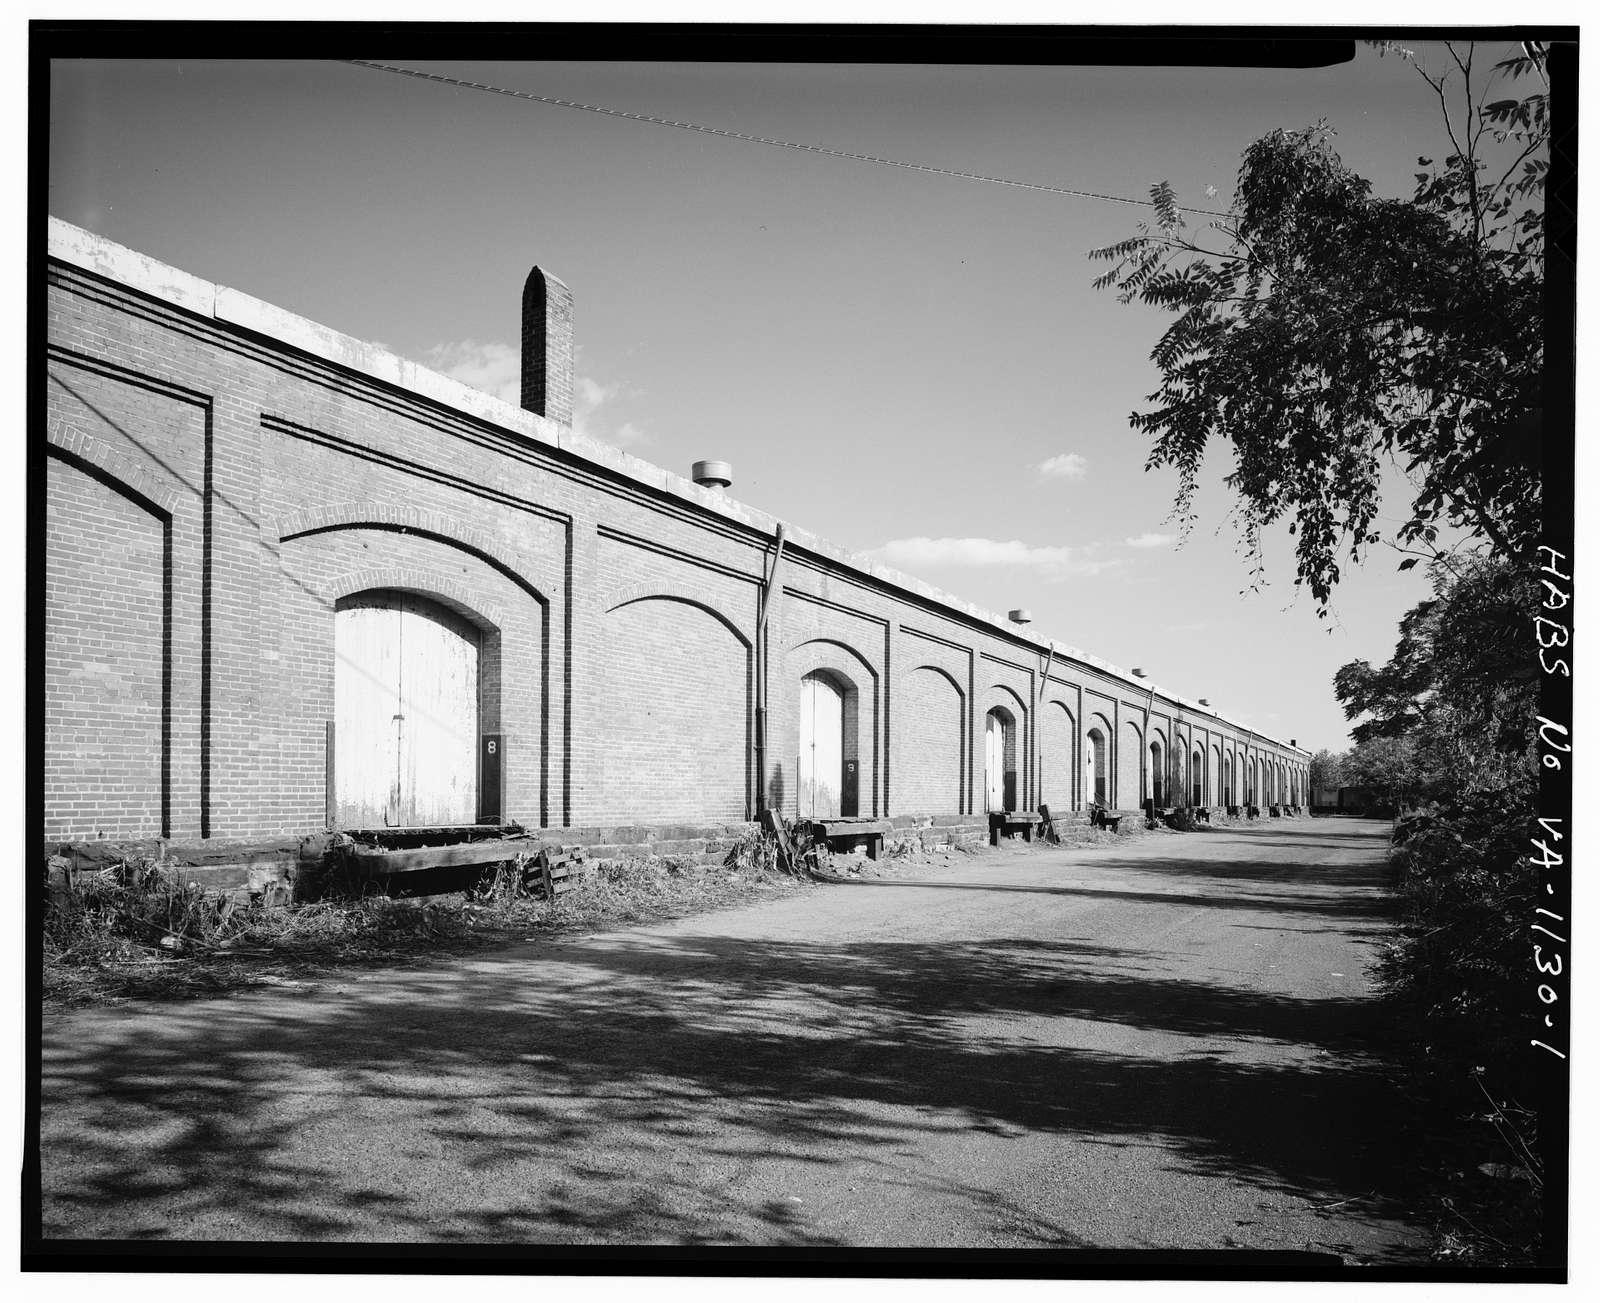 Norfolk & Western Freight Depot, Ninth & Eleventh Streets at bank of James River, Lynchburg, Lynchburg, VA